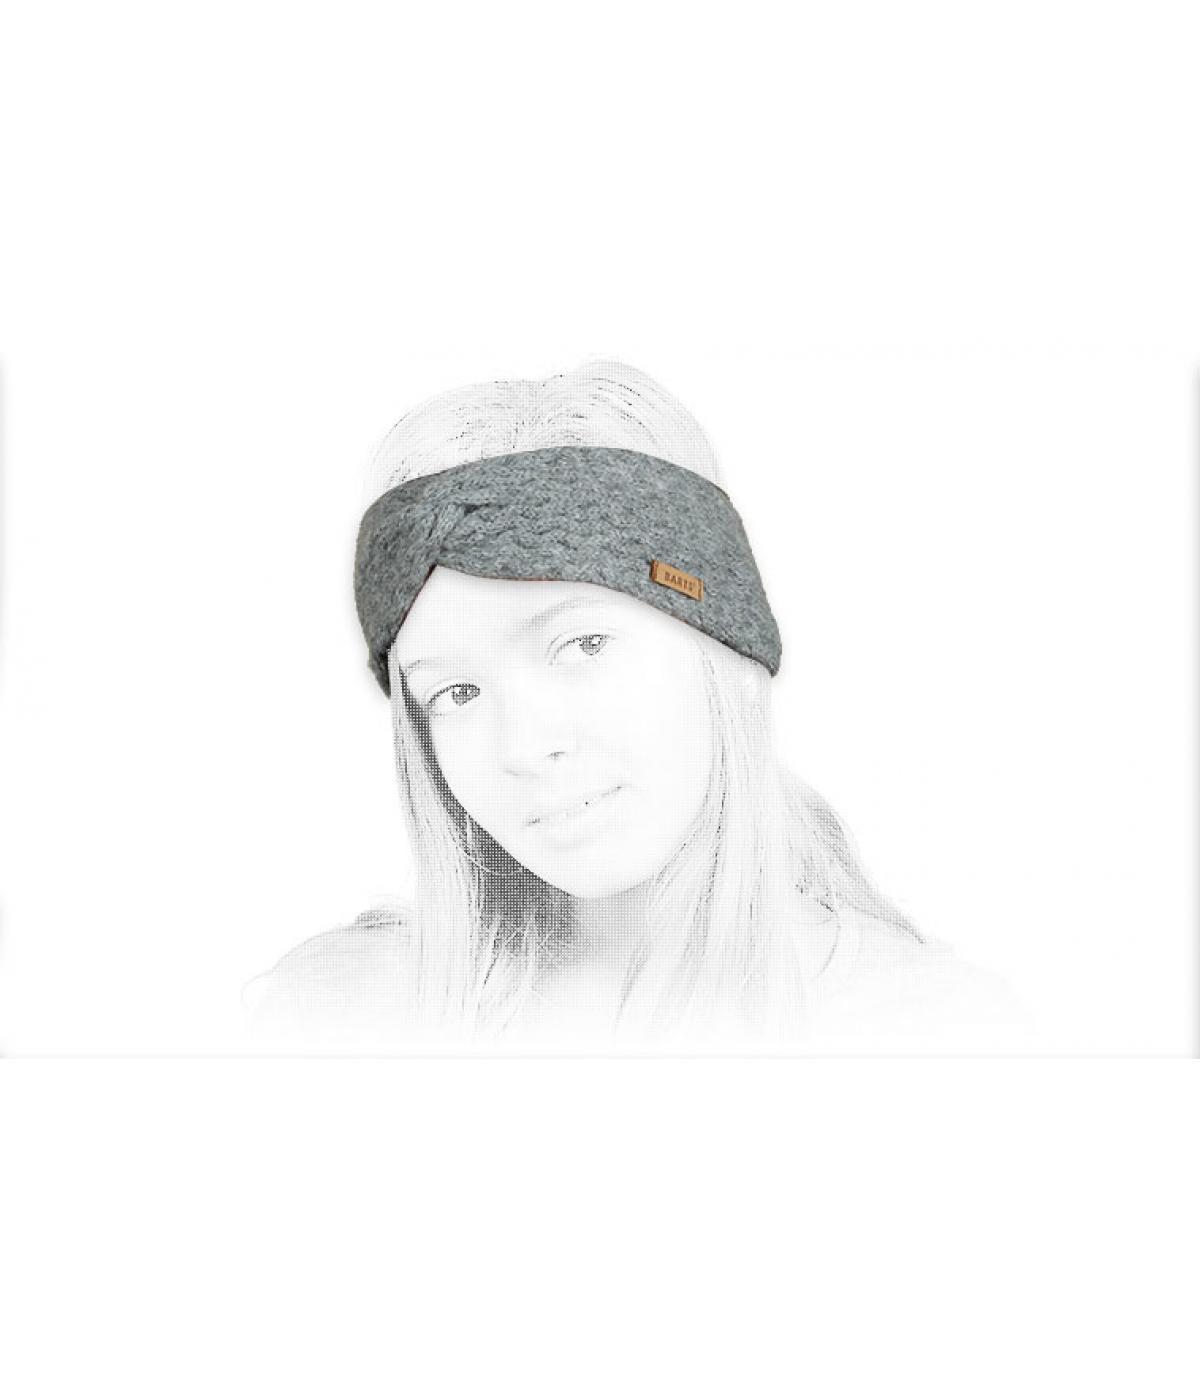 Details Kids Rozamond Headband heather grey - Abbildung 4